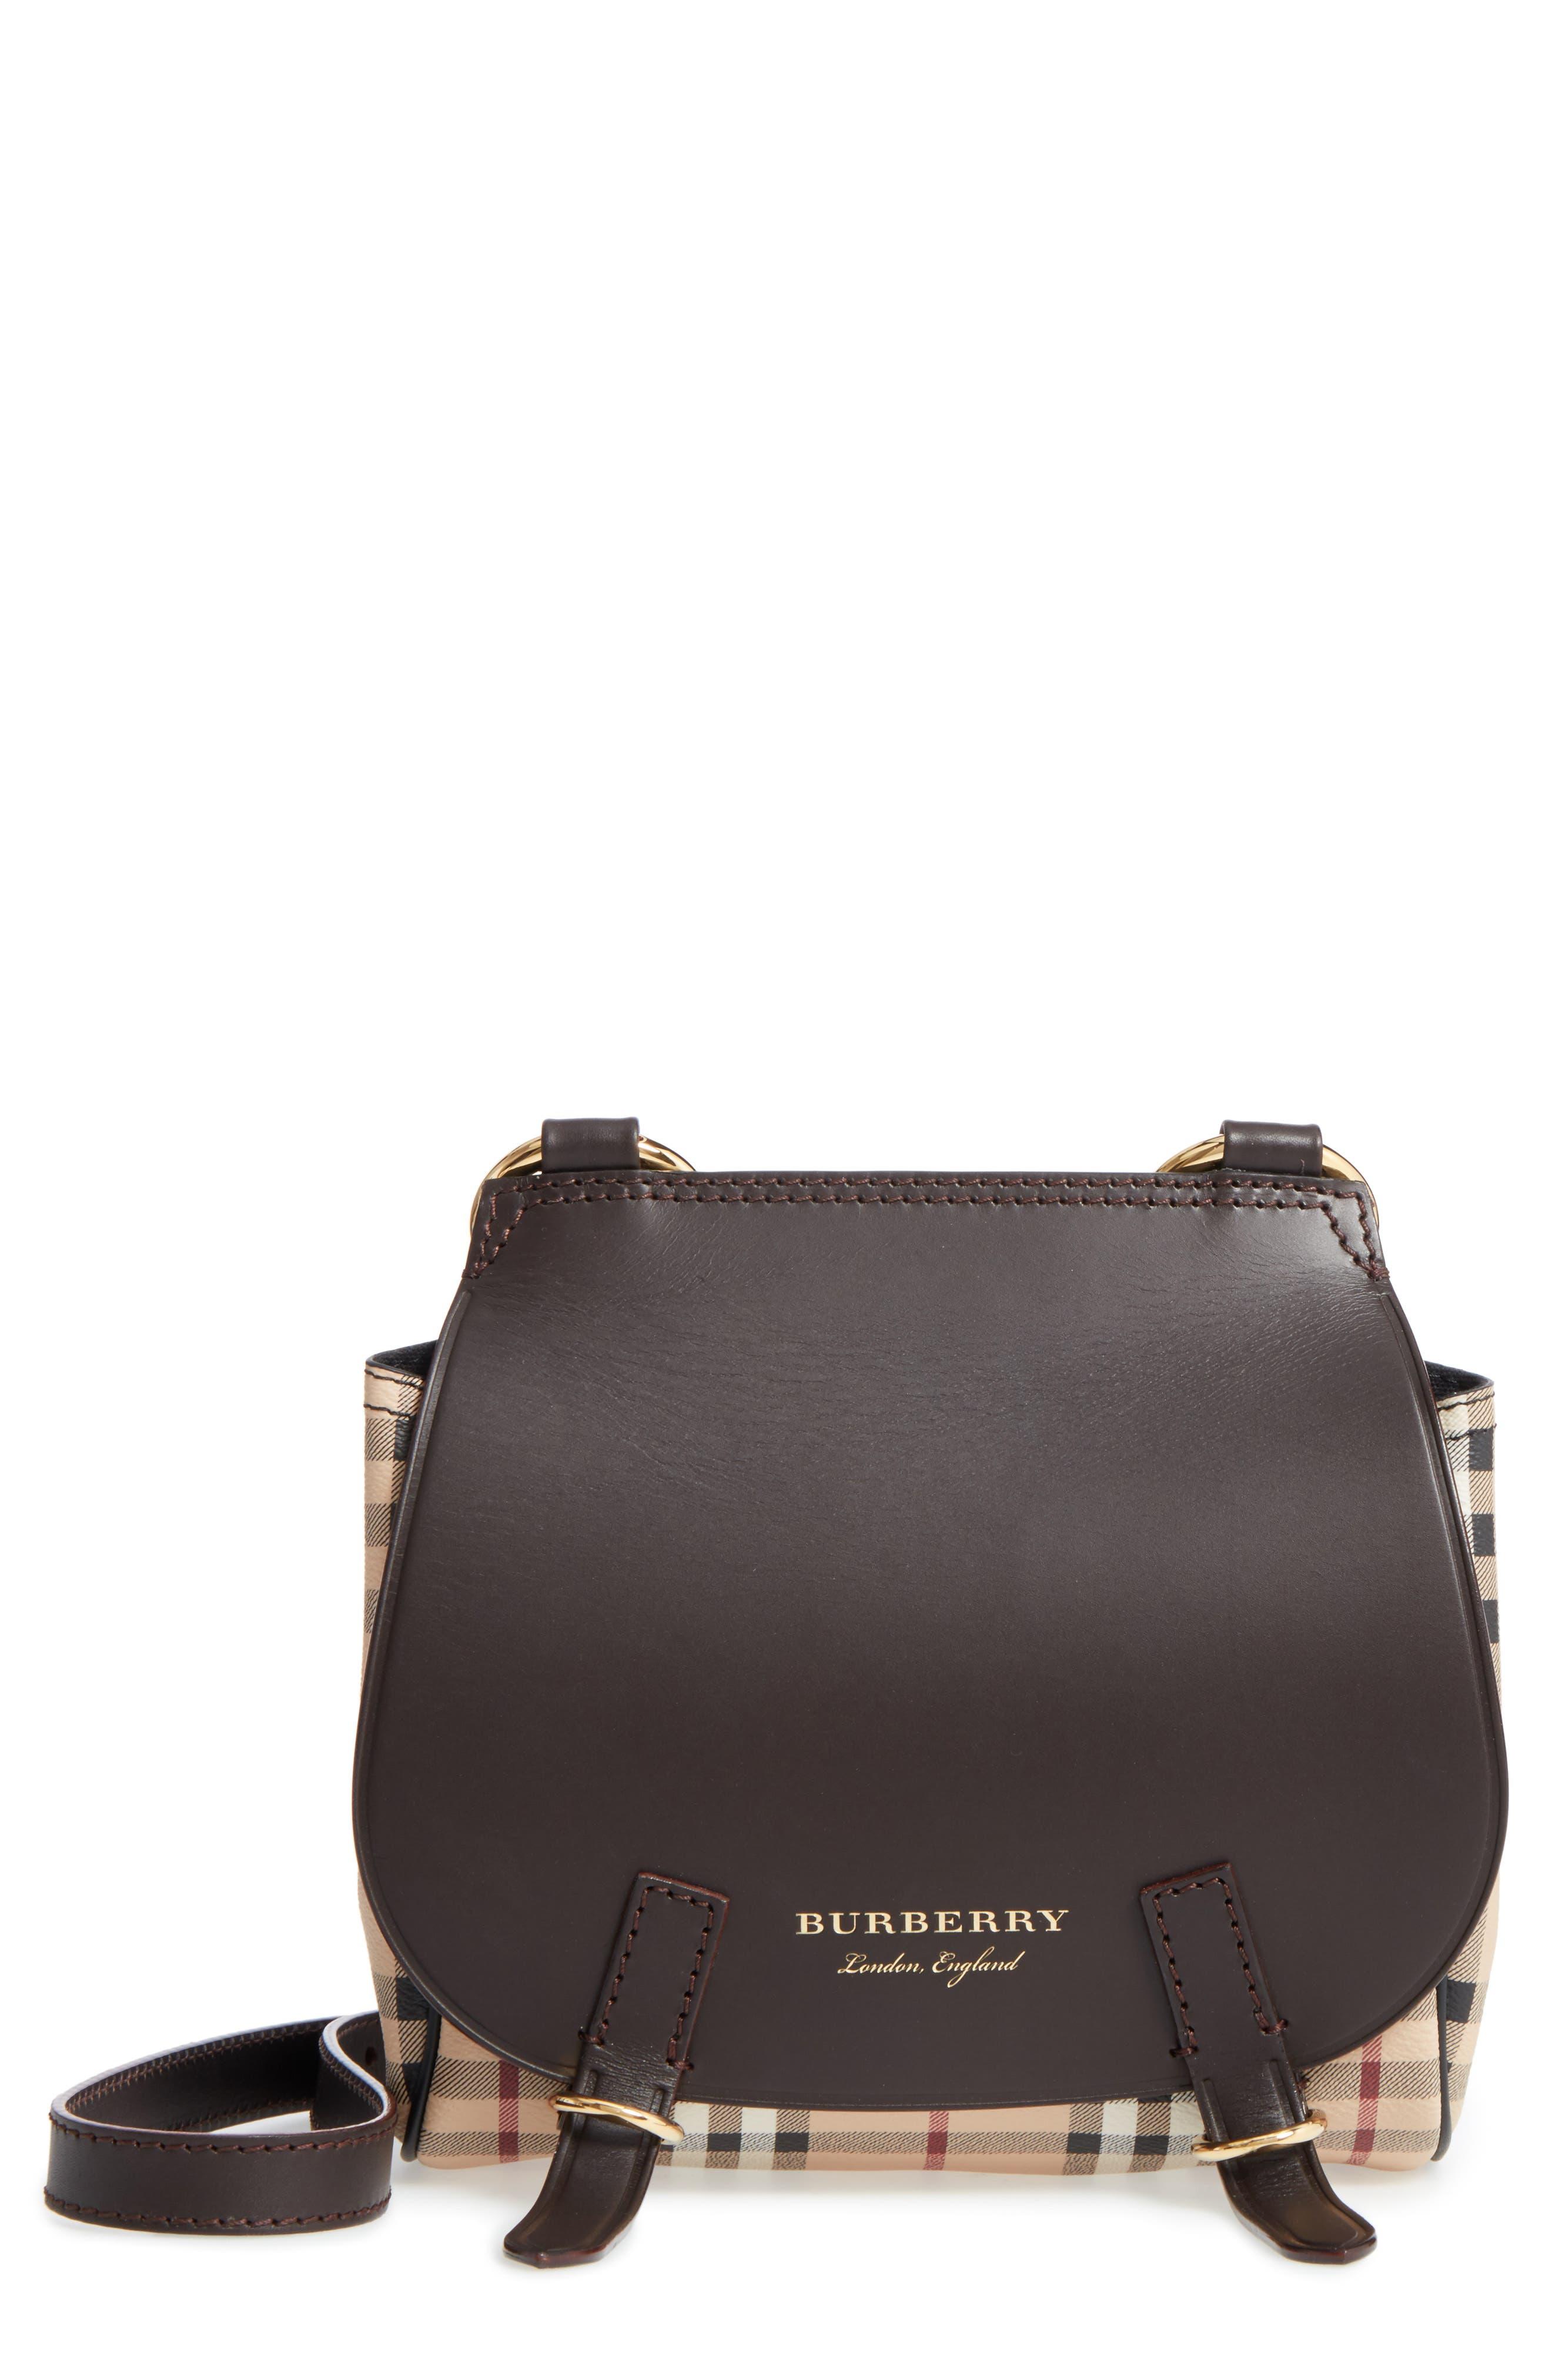 Burberry Bridle Leather & Check Shoulder Bag